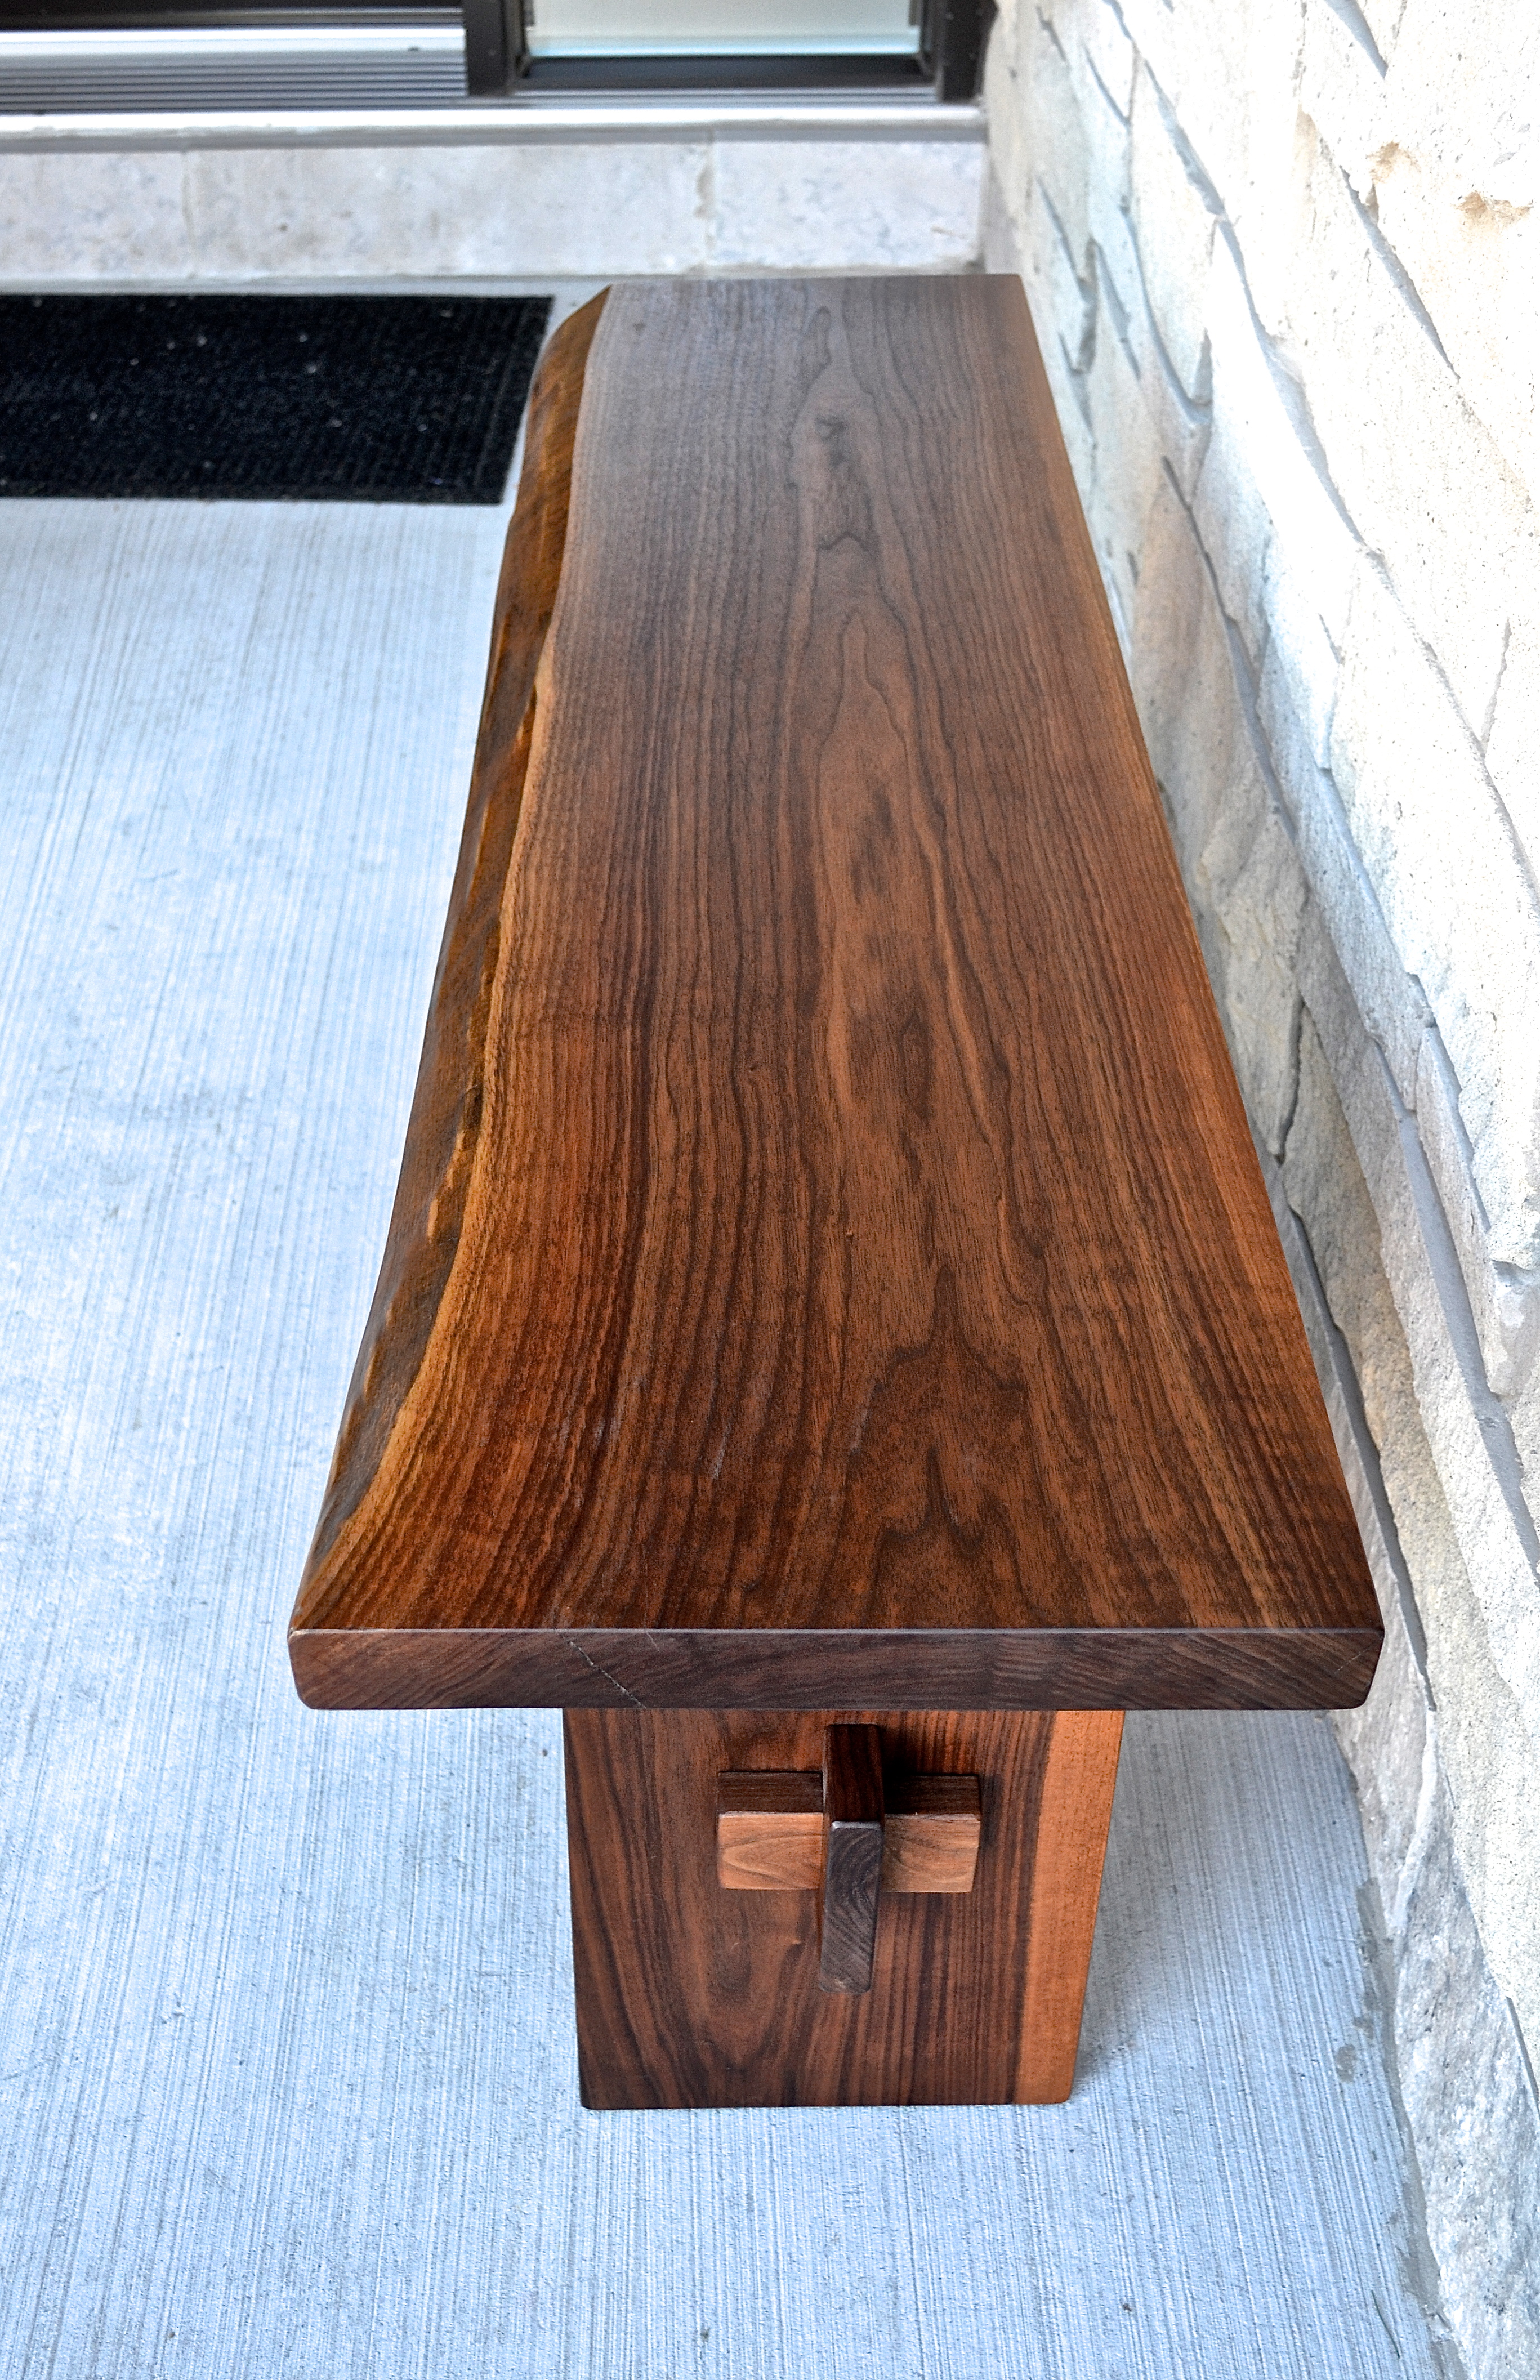 Live-edge black walnut bench